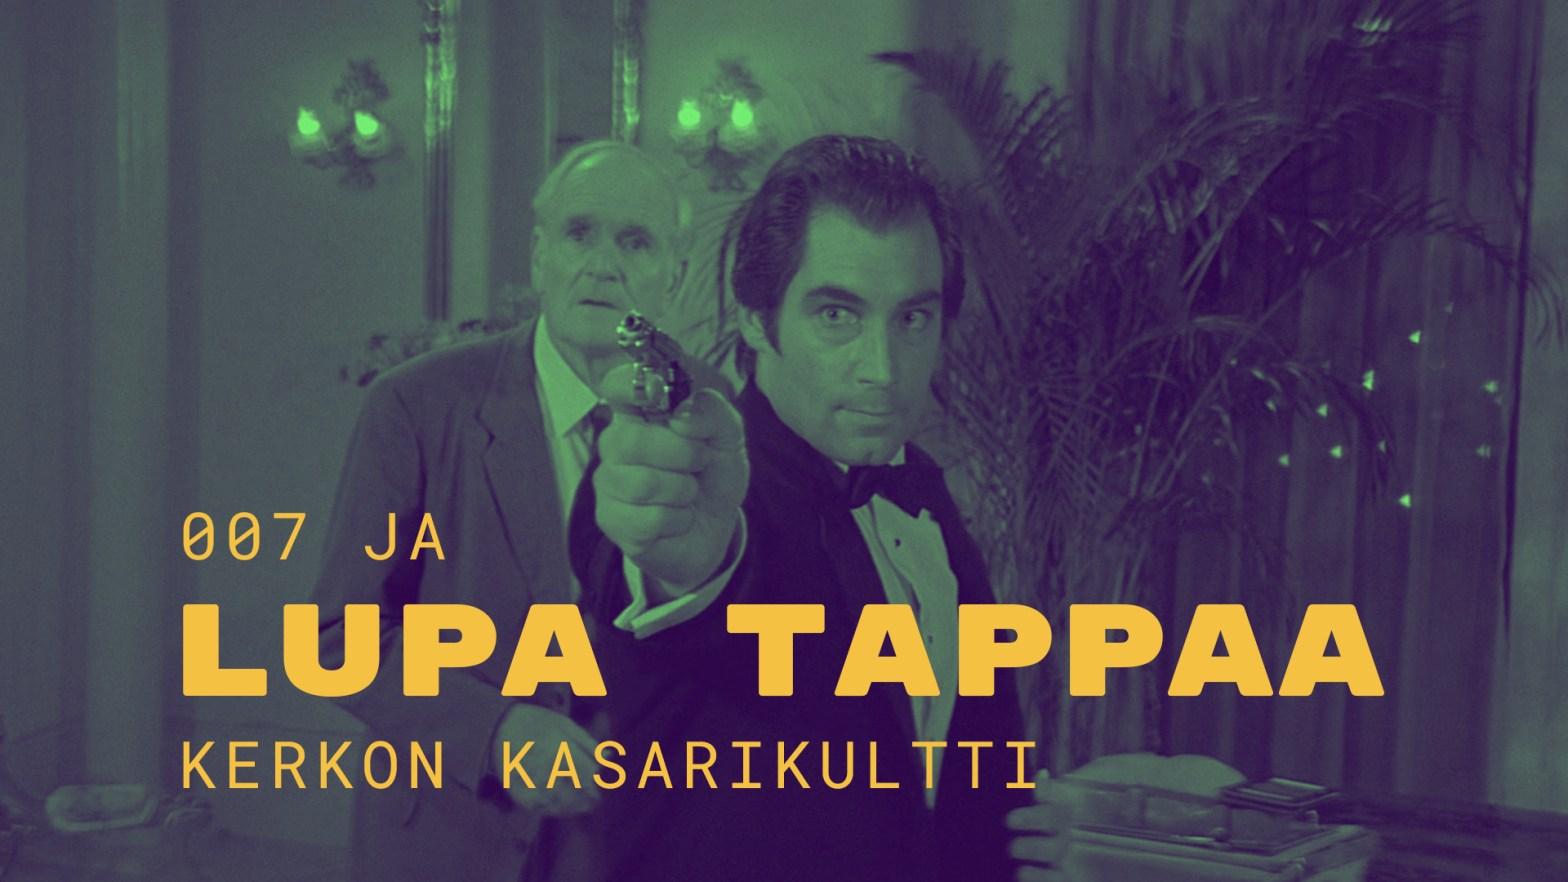 007 Lupa Tappaa (license to kill, 1989)